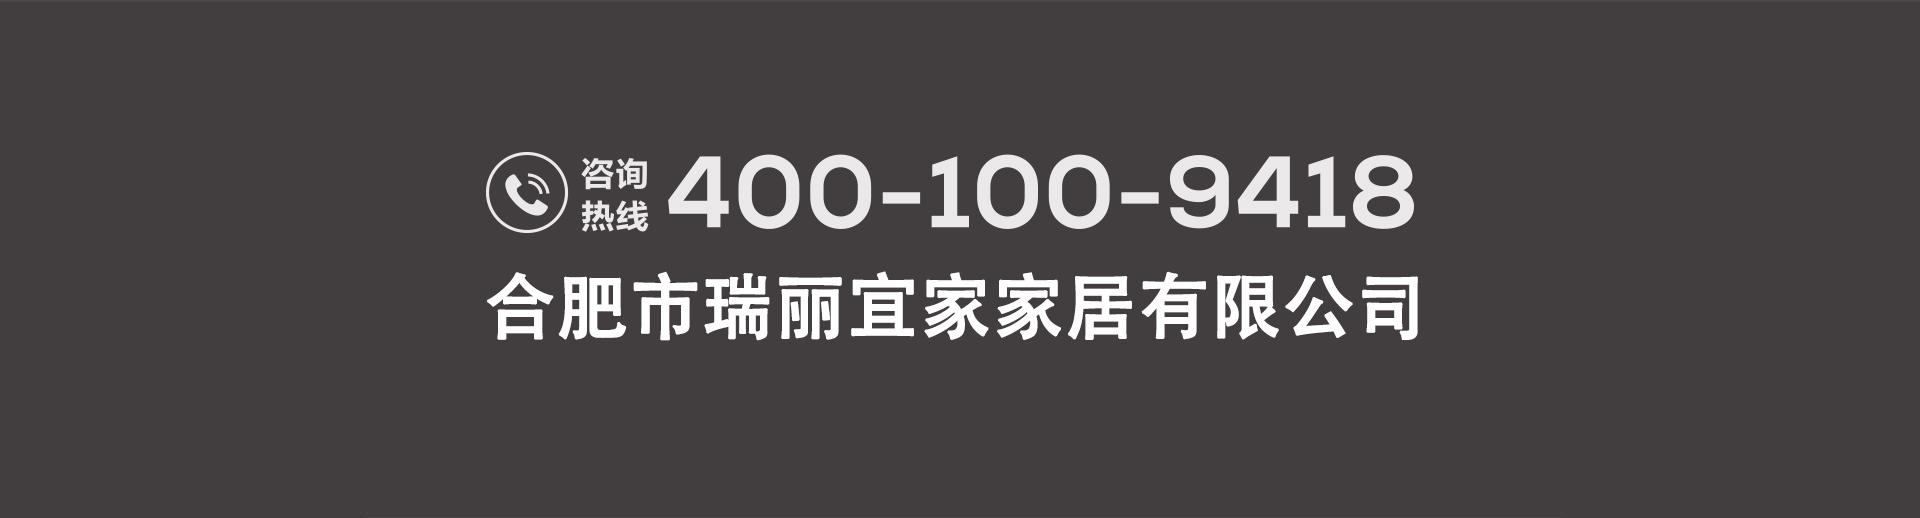 400-100-9418